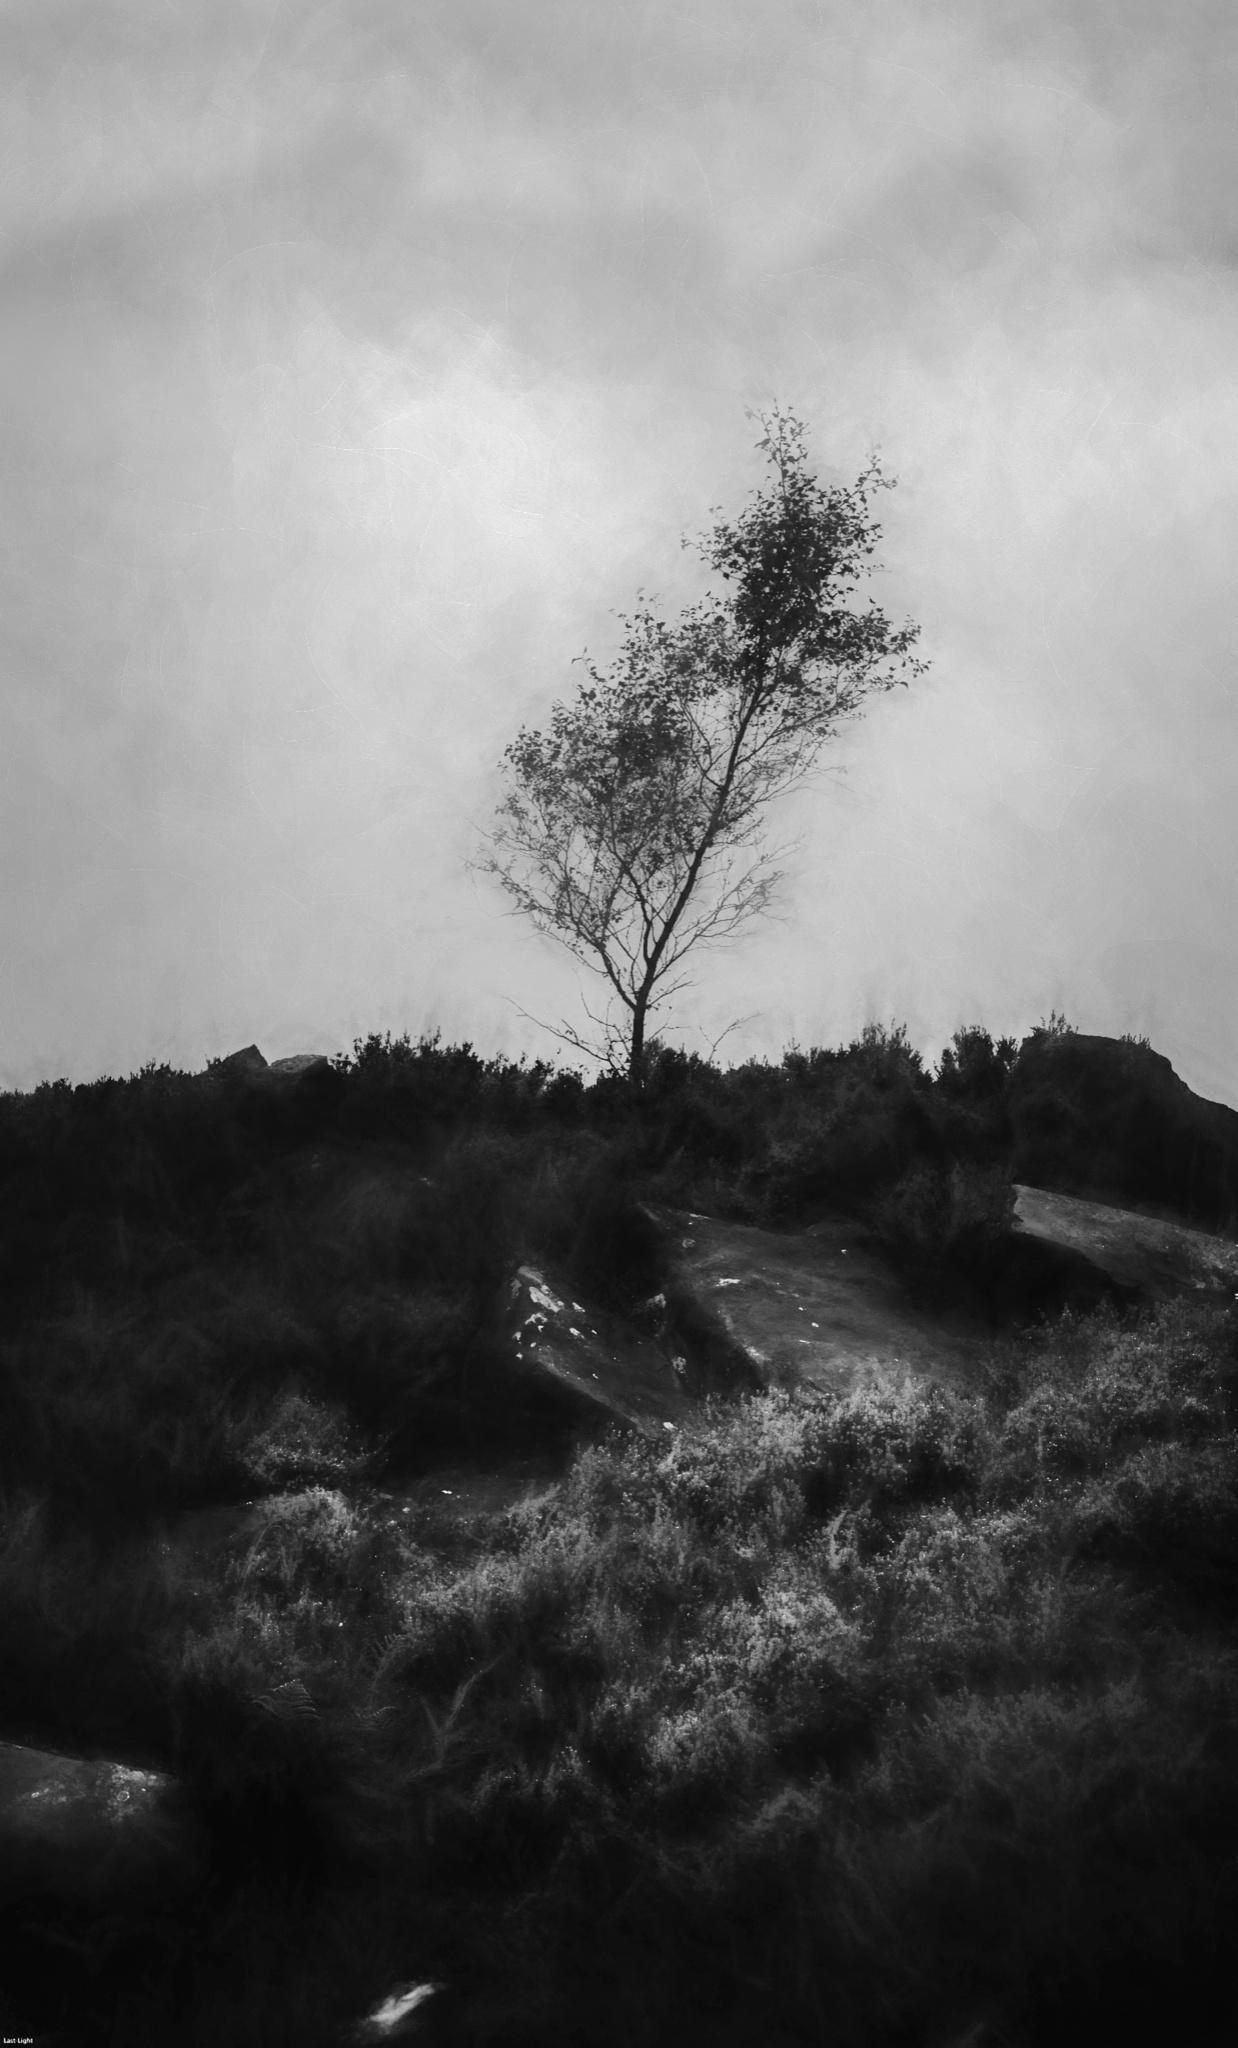 Sapling - Stone Edge by David Hawkes